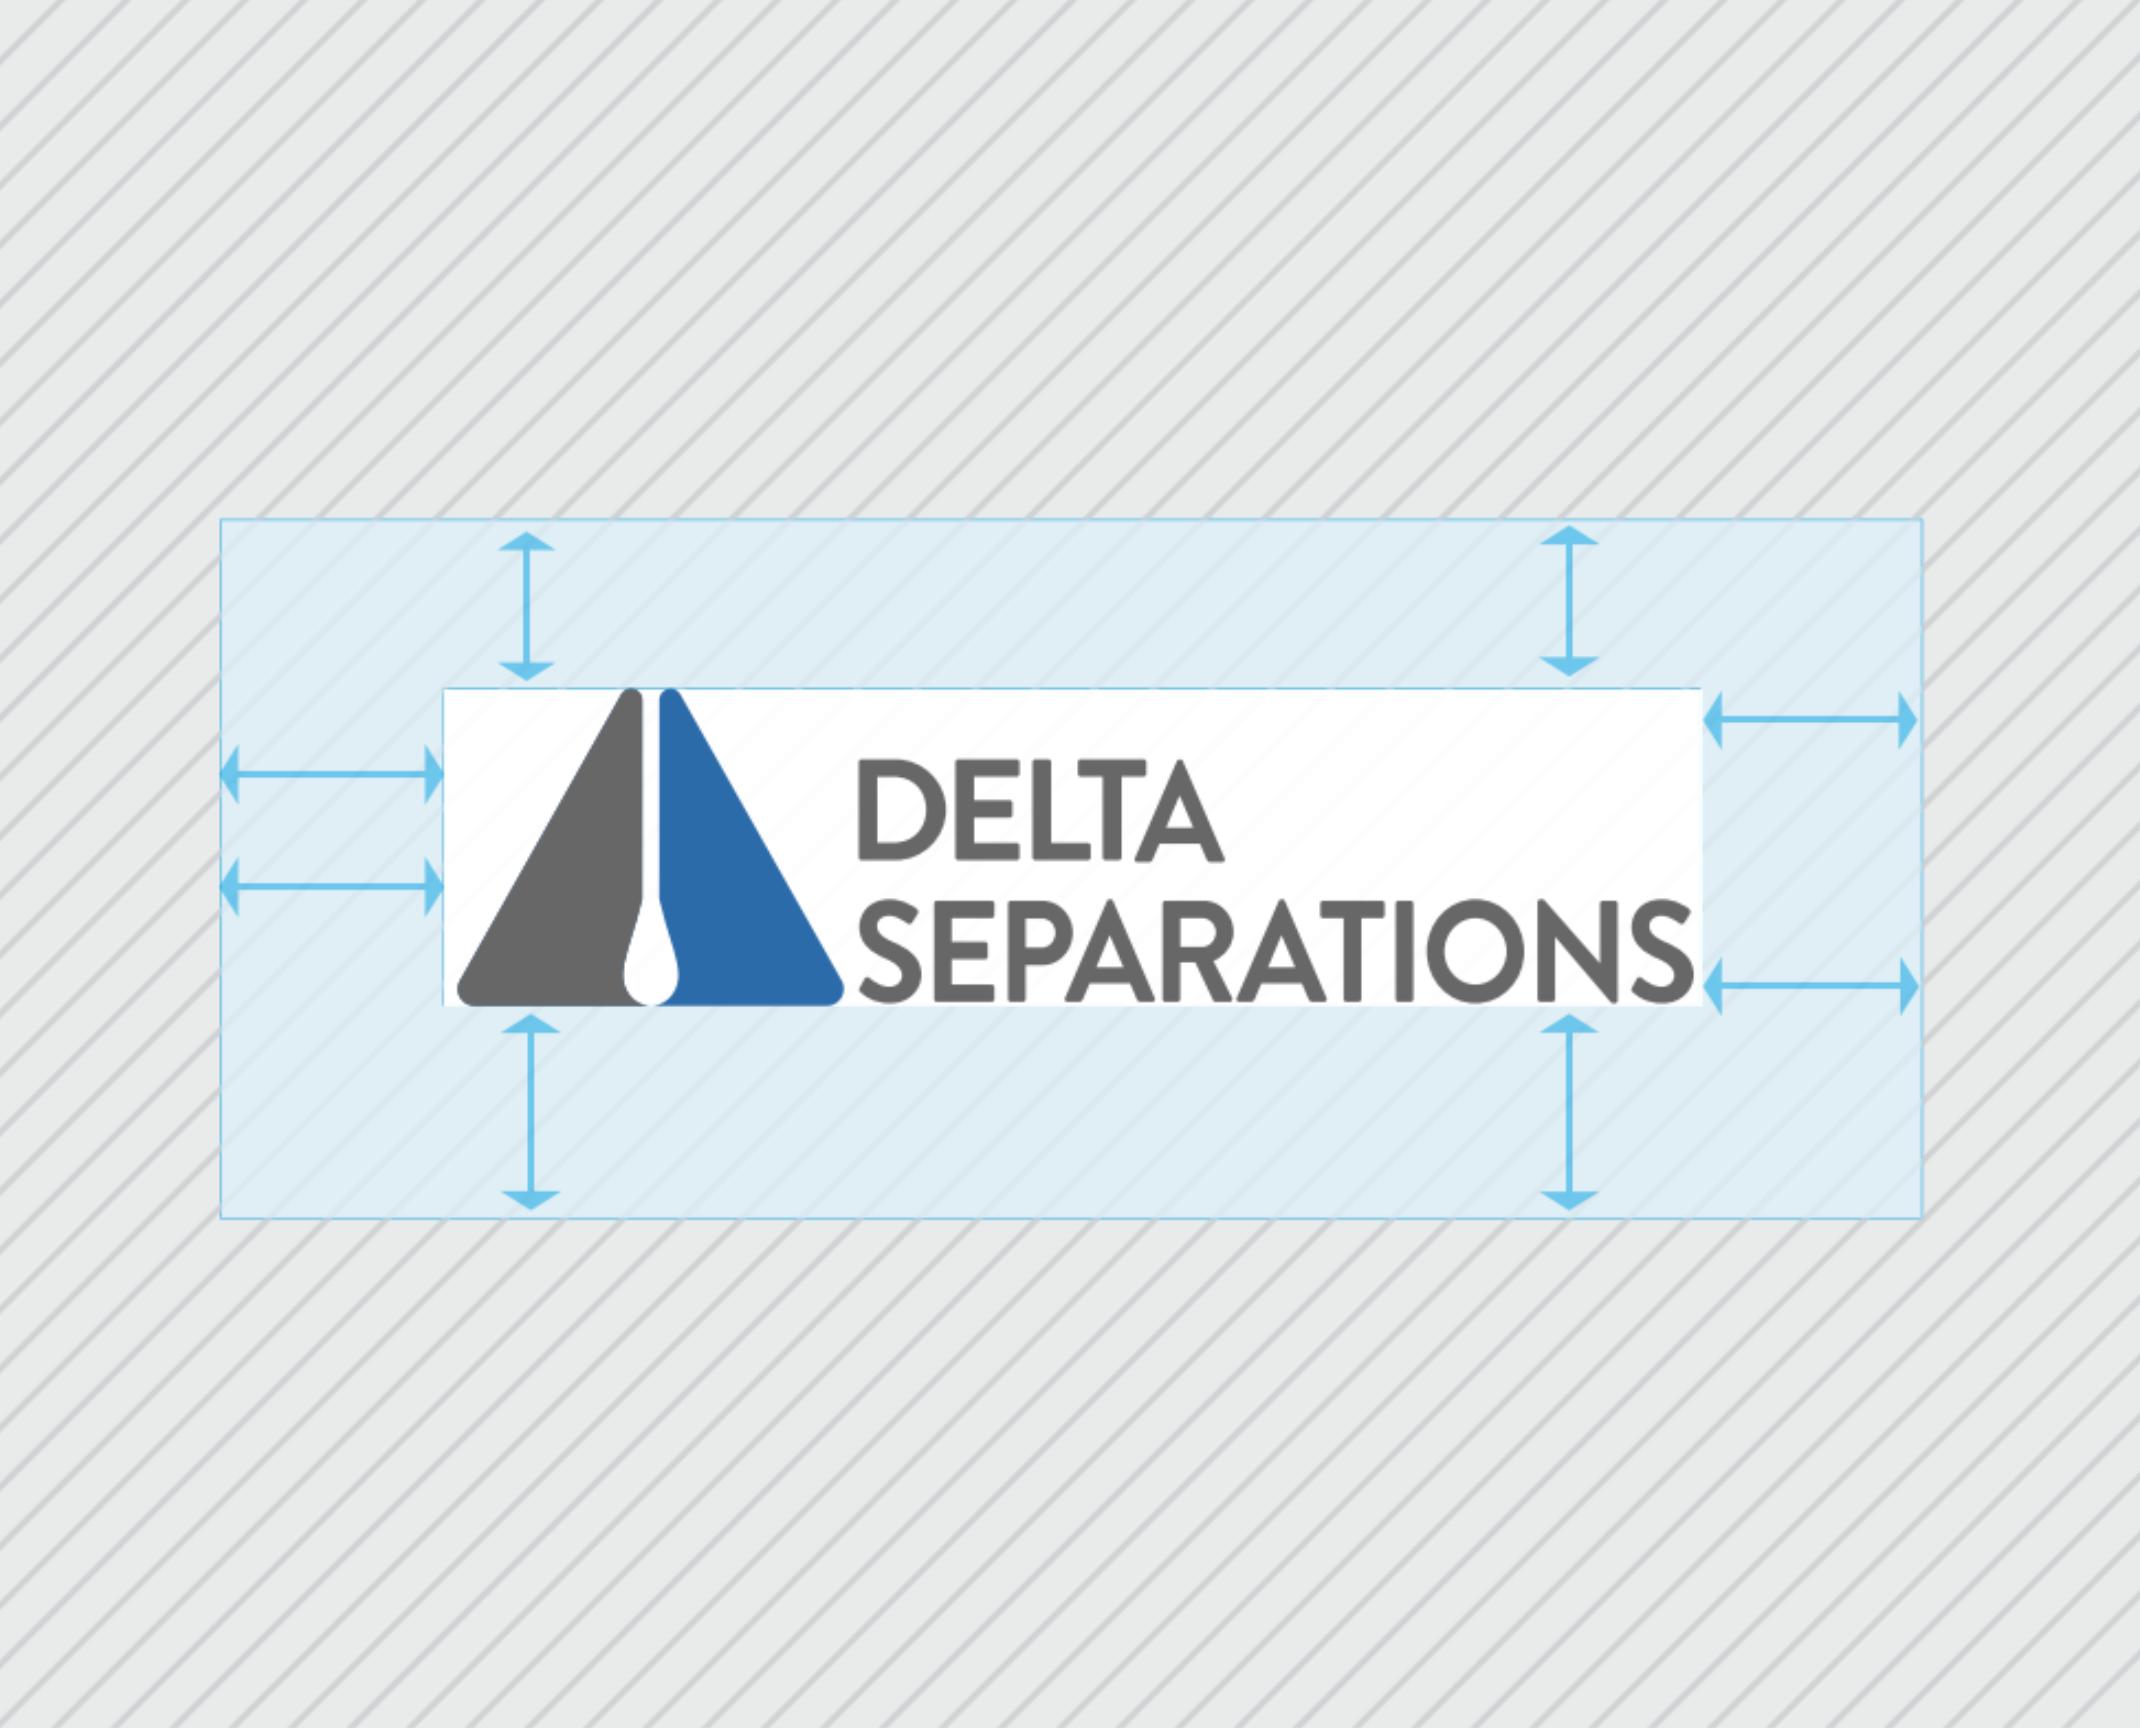 delta logo showing crop marks